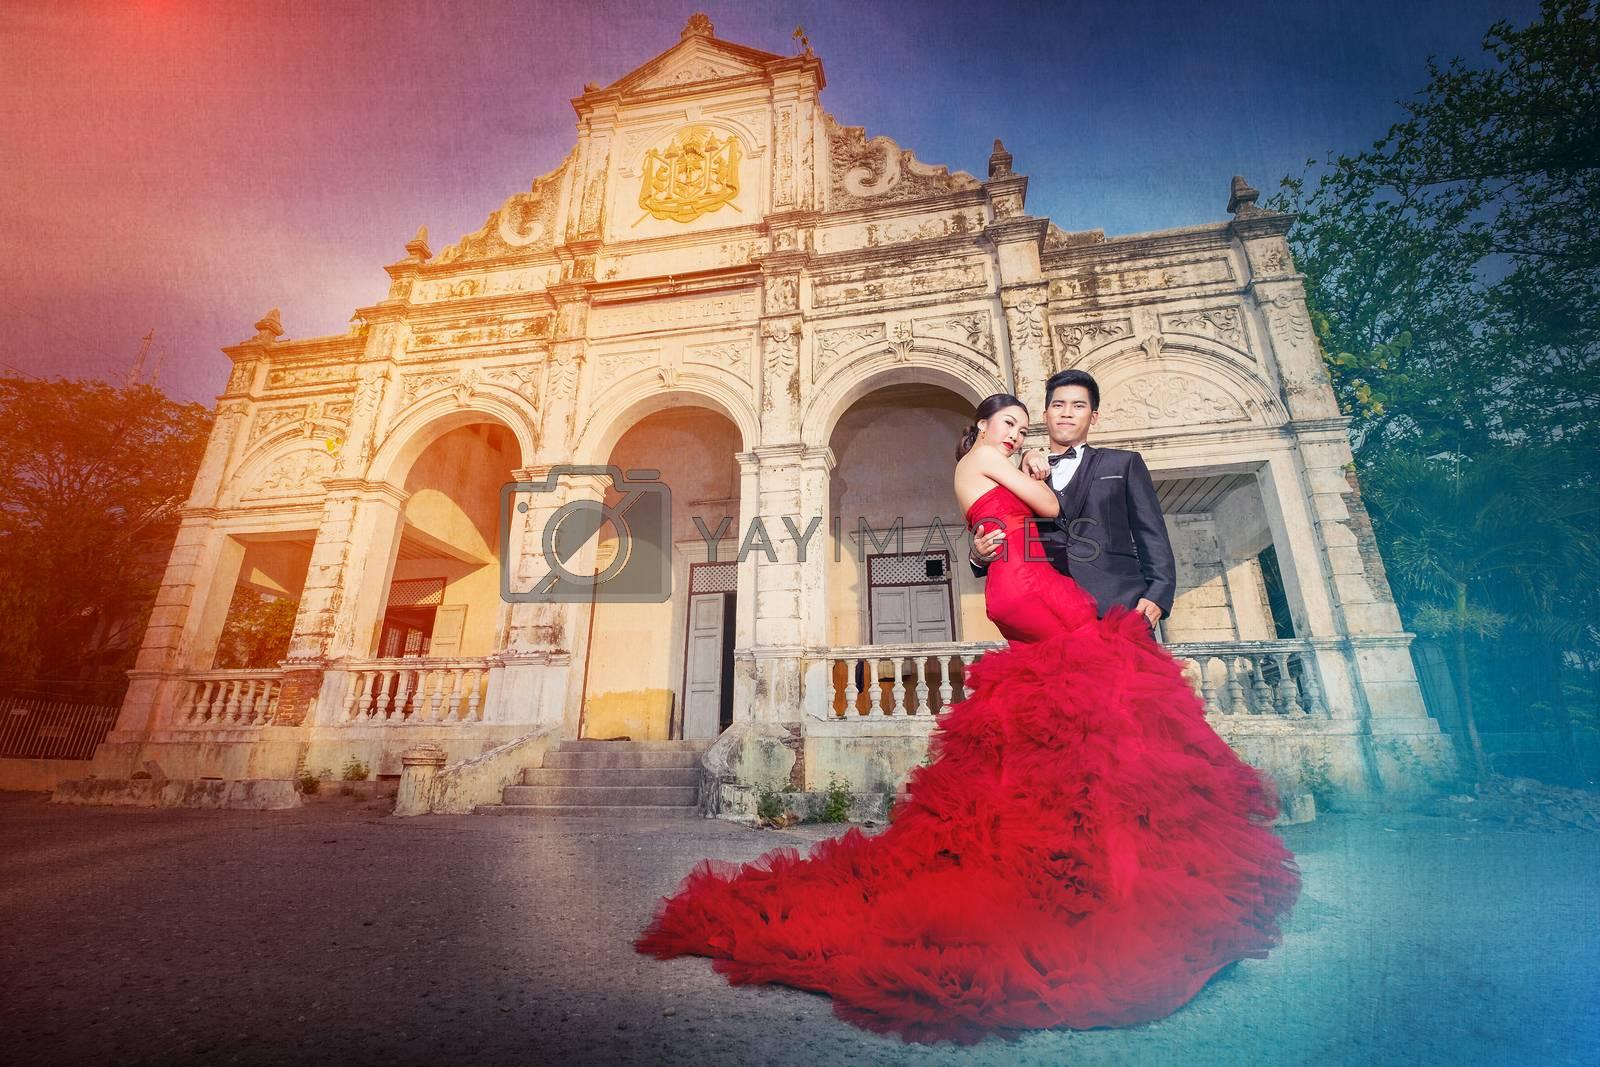 Man and Beautyful woman wearing fashionable red dress